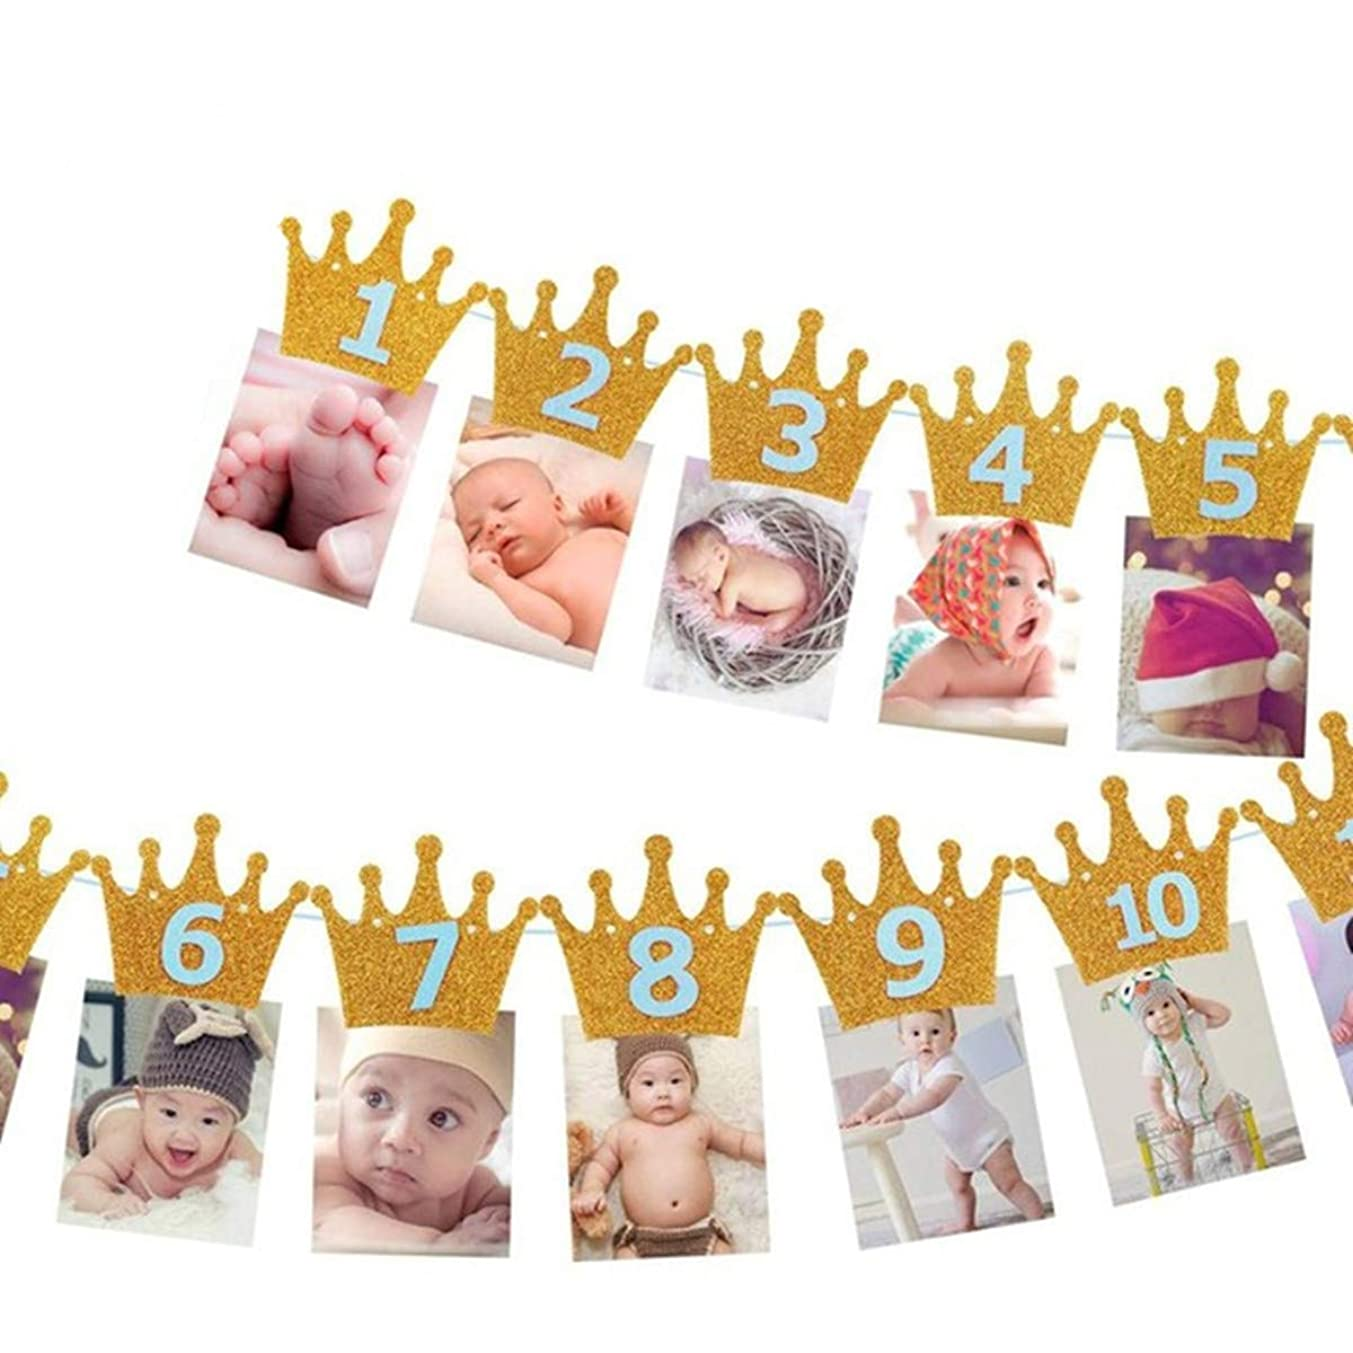 Symphony Birthday Photo Banner, 1st Birthday Baby Photo Banner Newborn to 12 Months Birthday Party Decor (Crown Golden Blue)